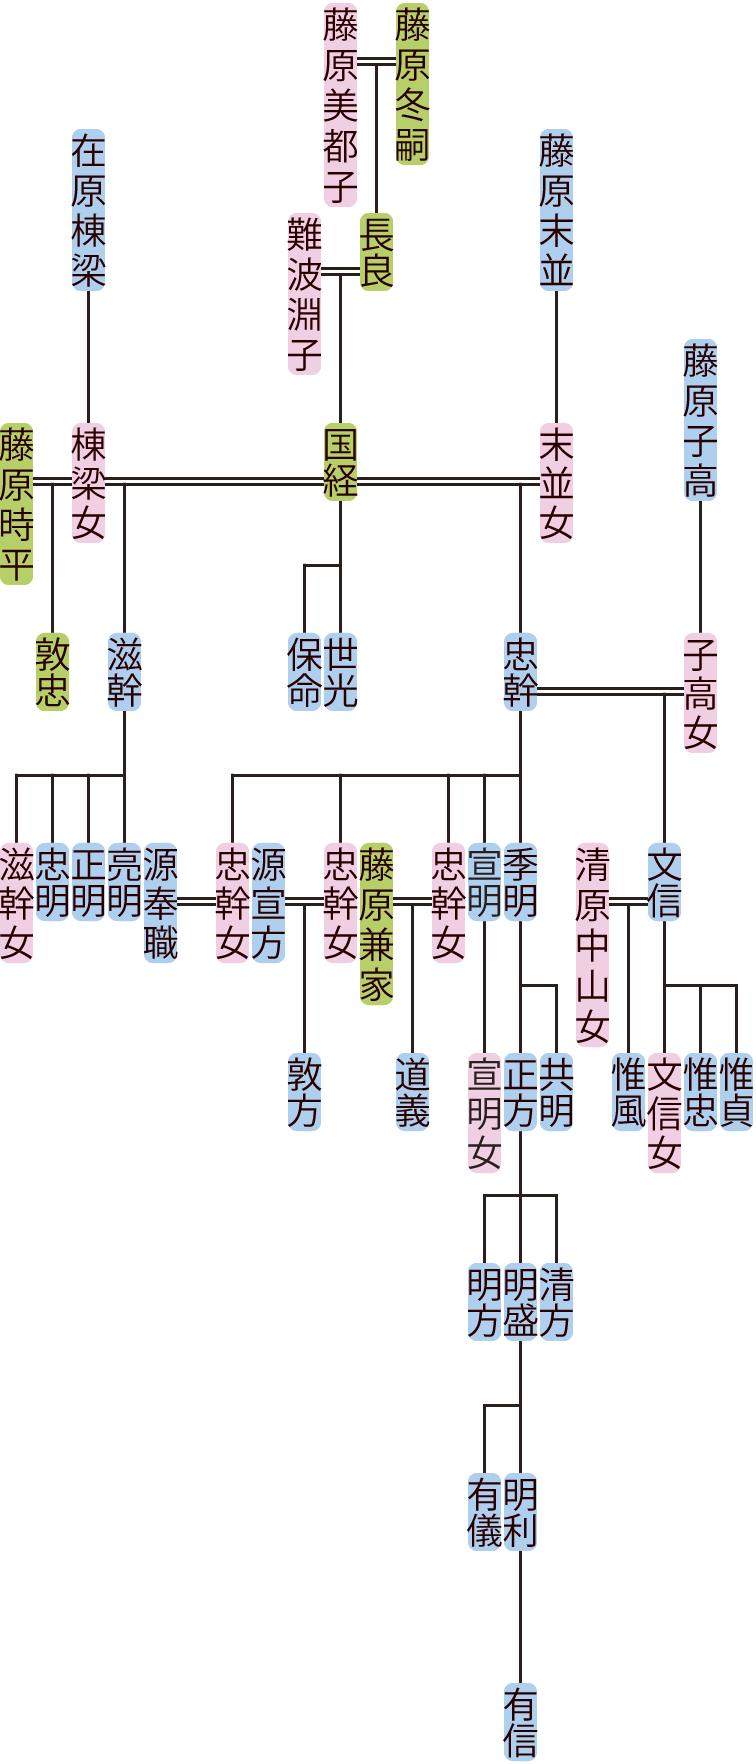 藤原国経・忠幹の系図